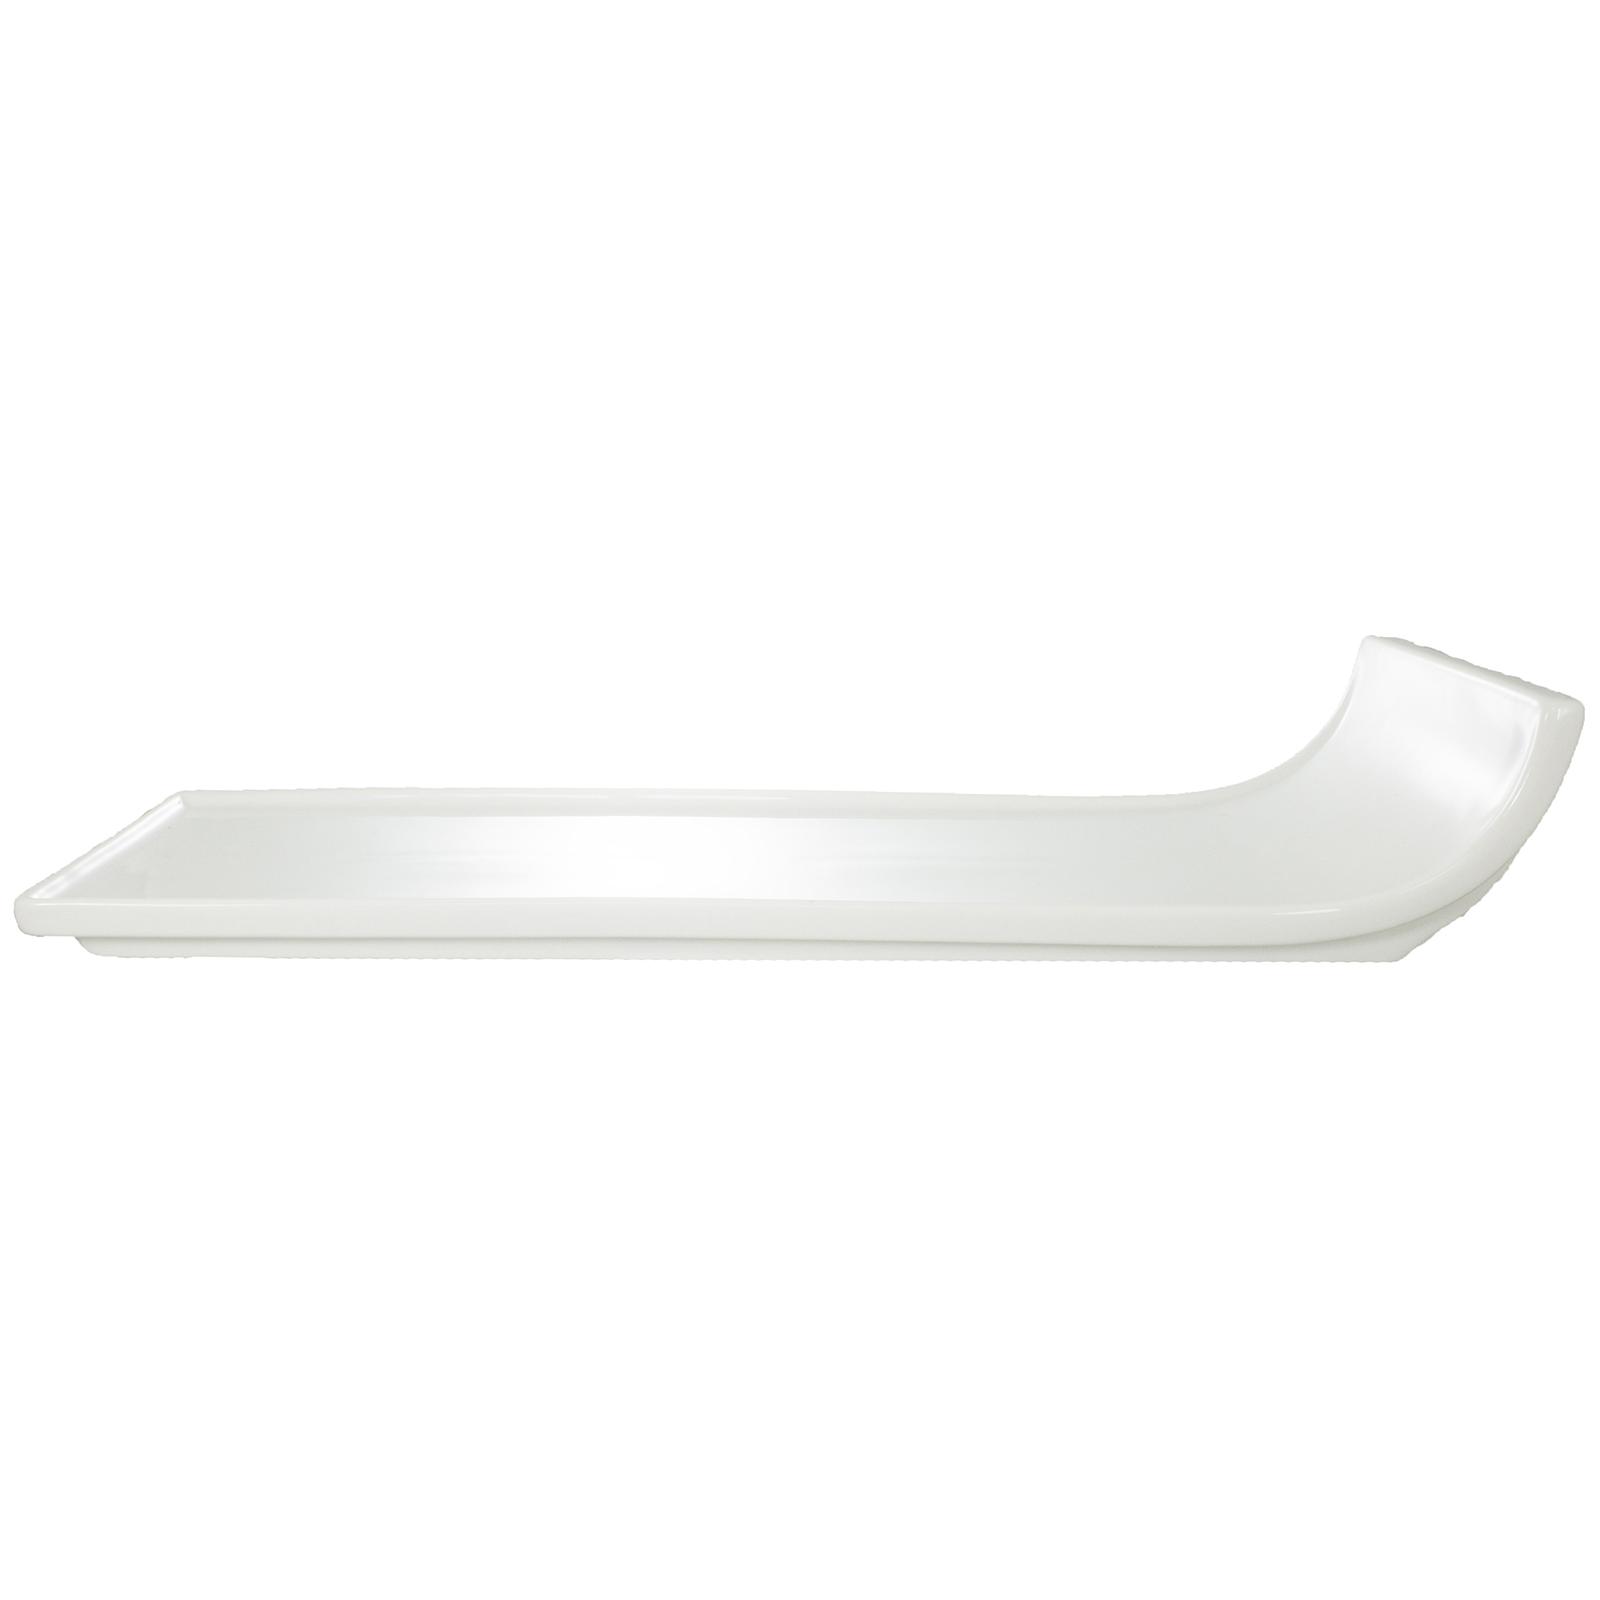 International Tableware SL-160 tray, china